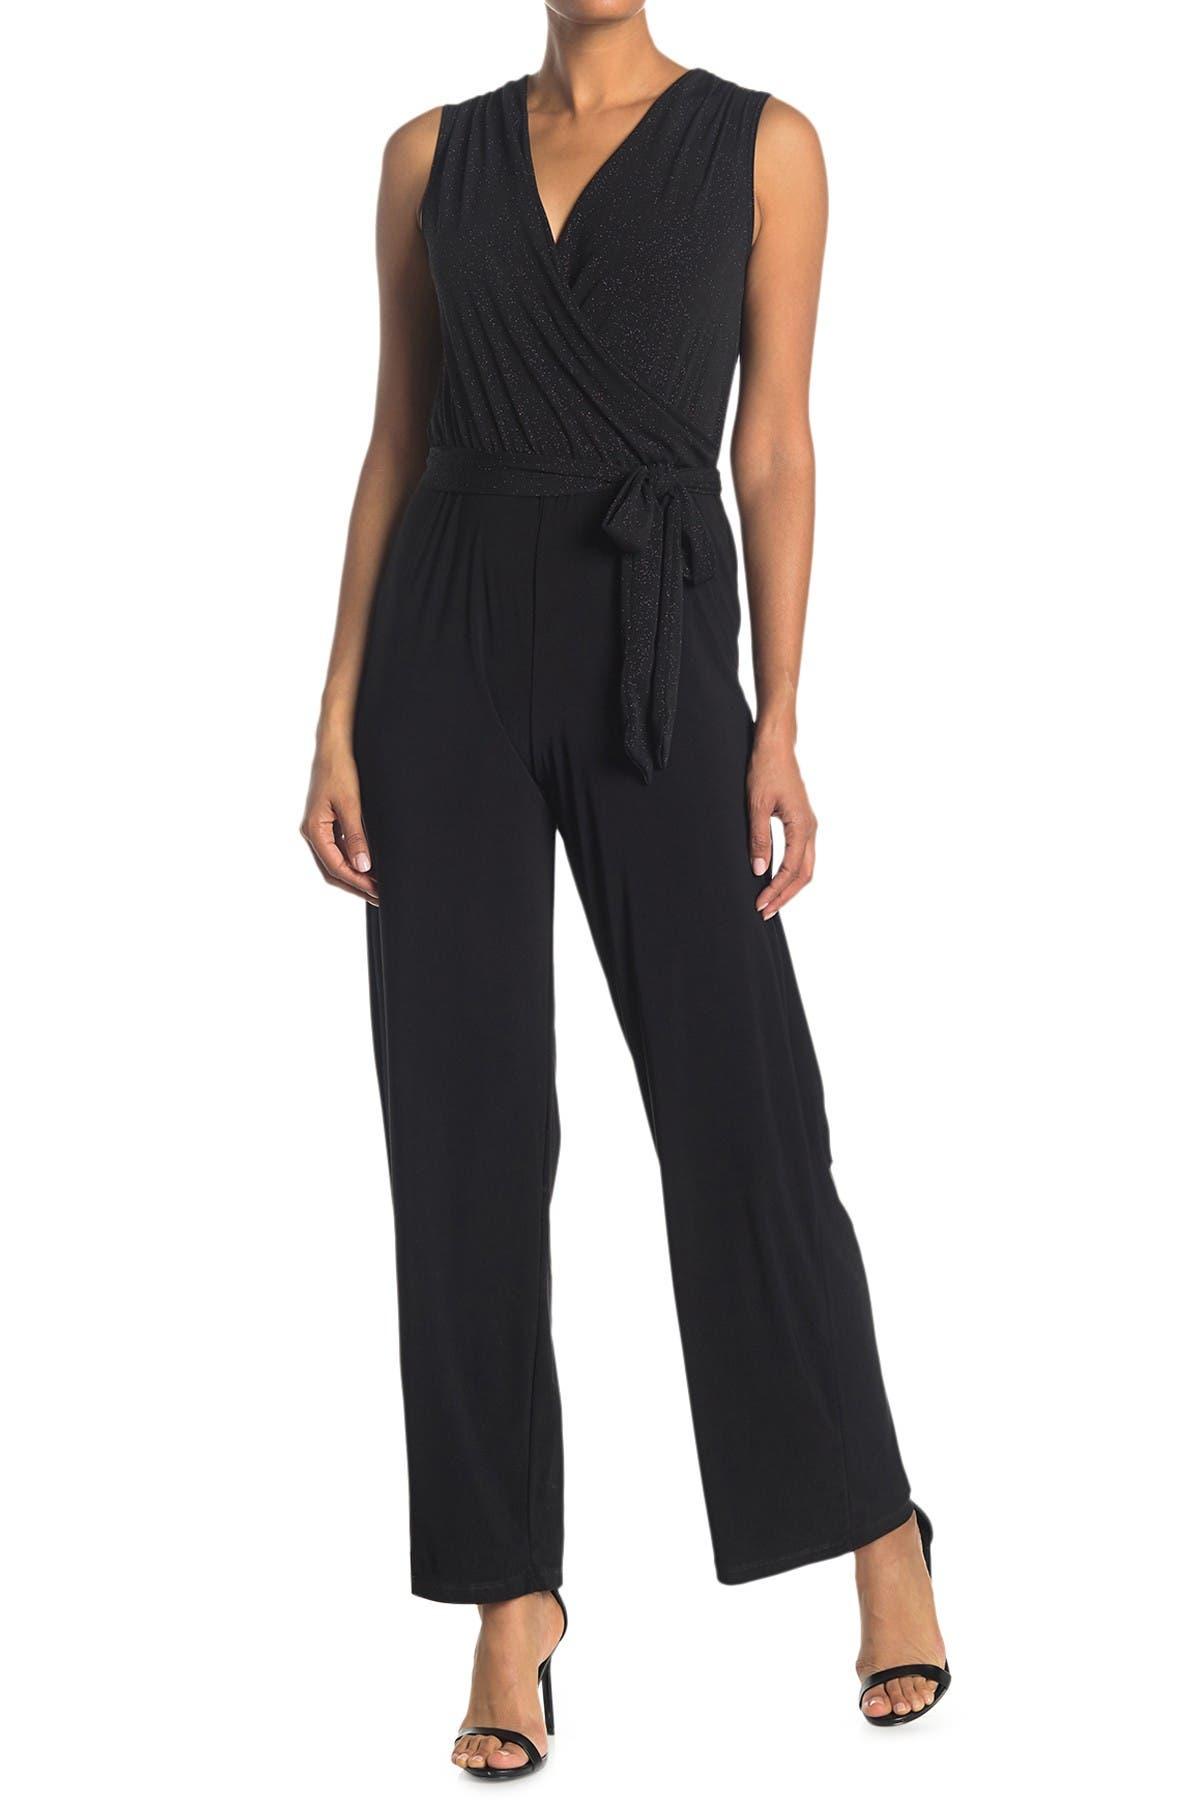 Image of TASH + SOPHIE Jersey Jumpsuit Glitter Top